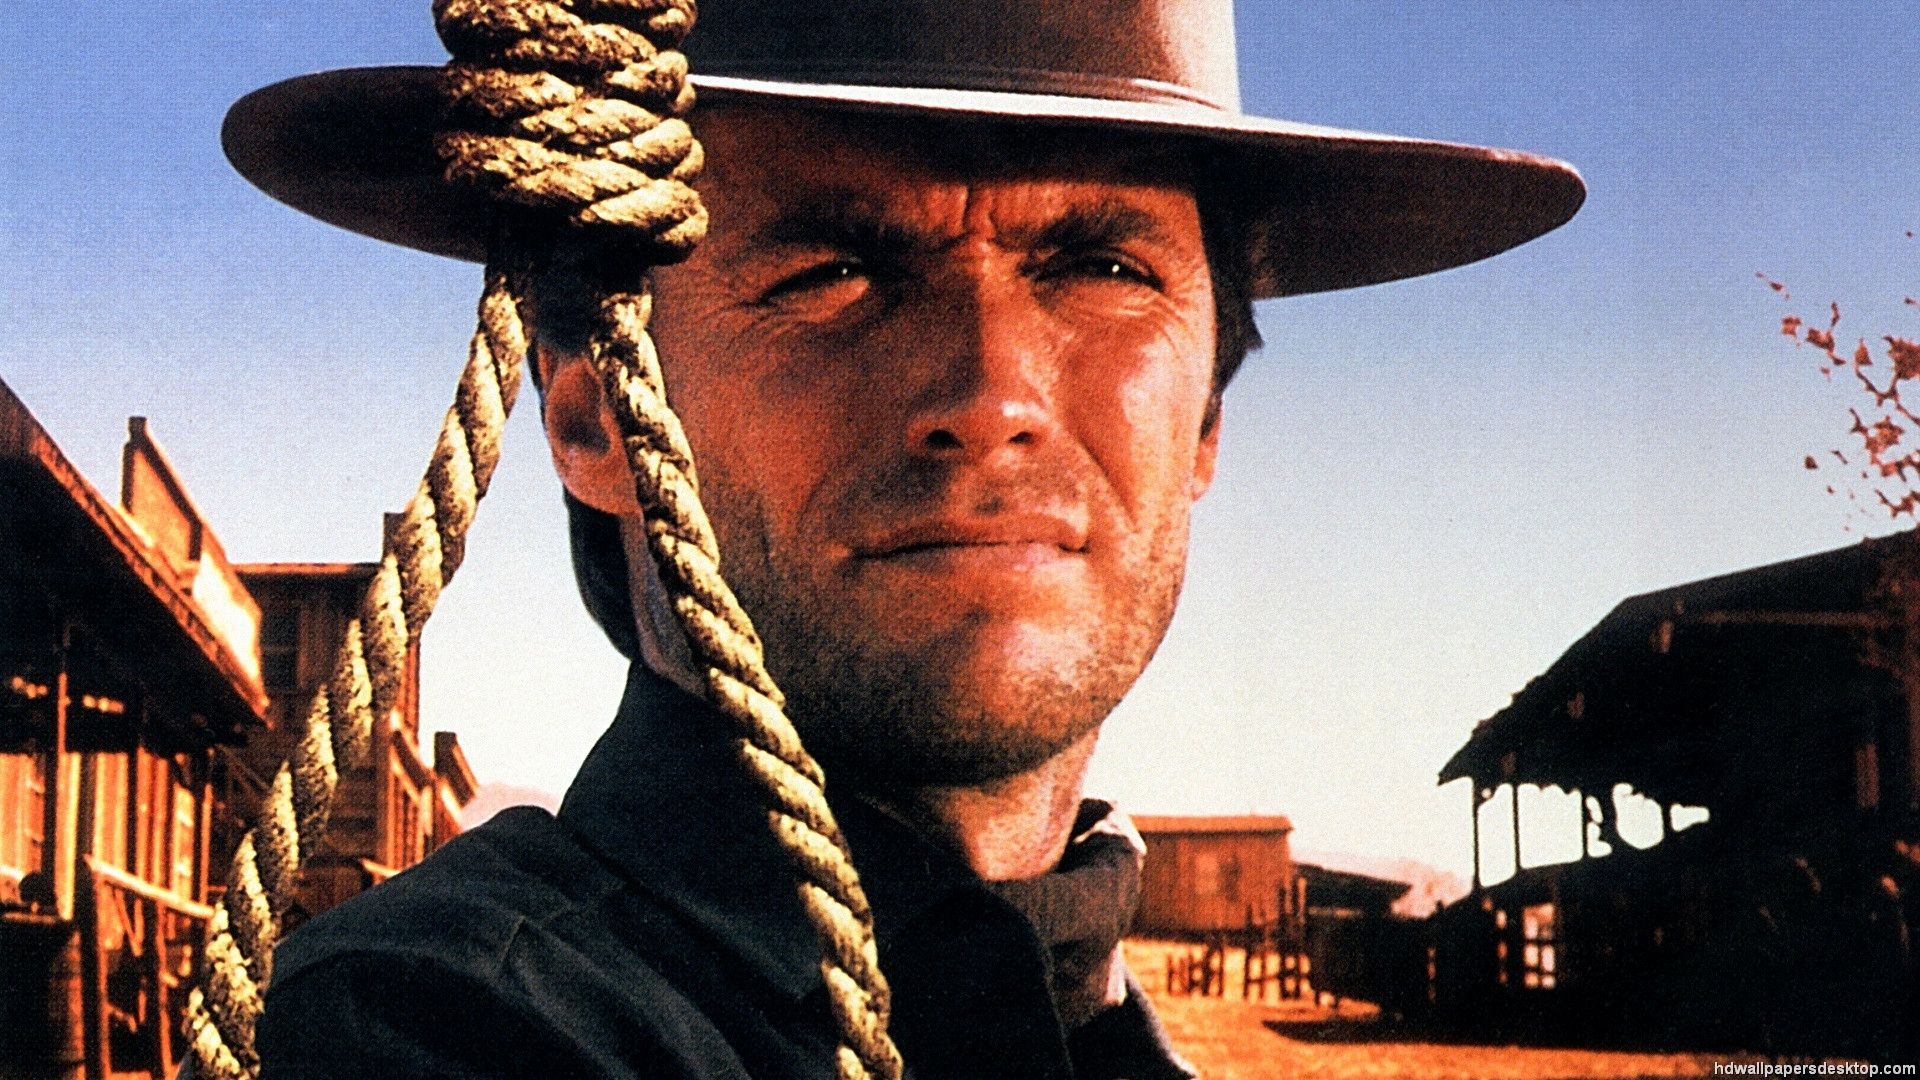 Clint Eastwood Wallpaper Clint Eastwood Film Sympa Clint Eastwood Affiche De Film